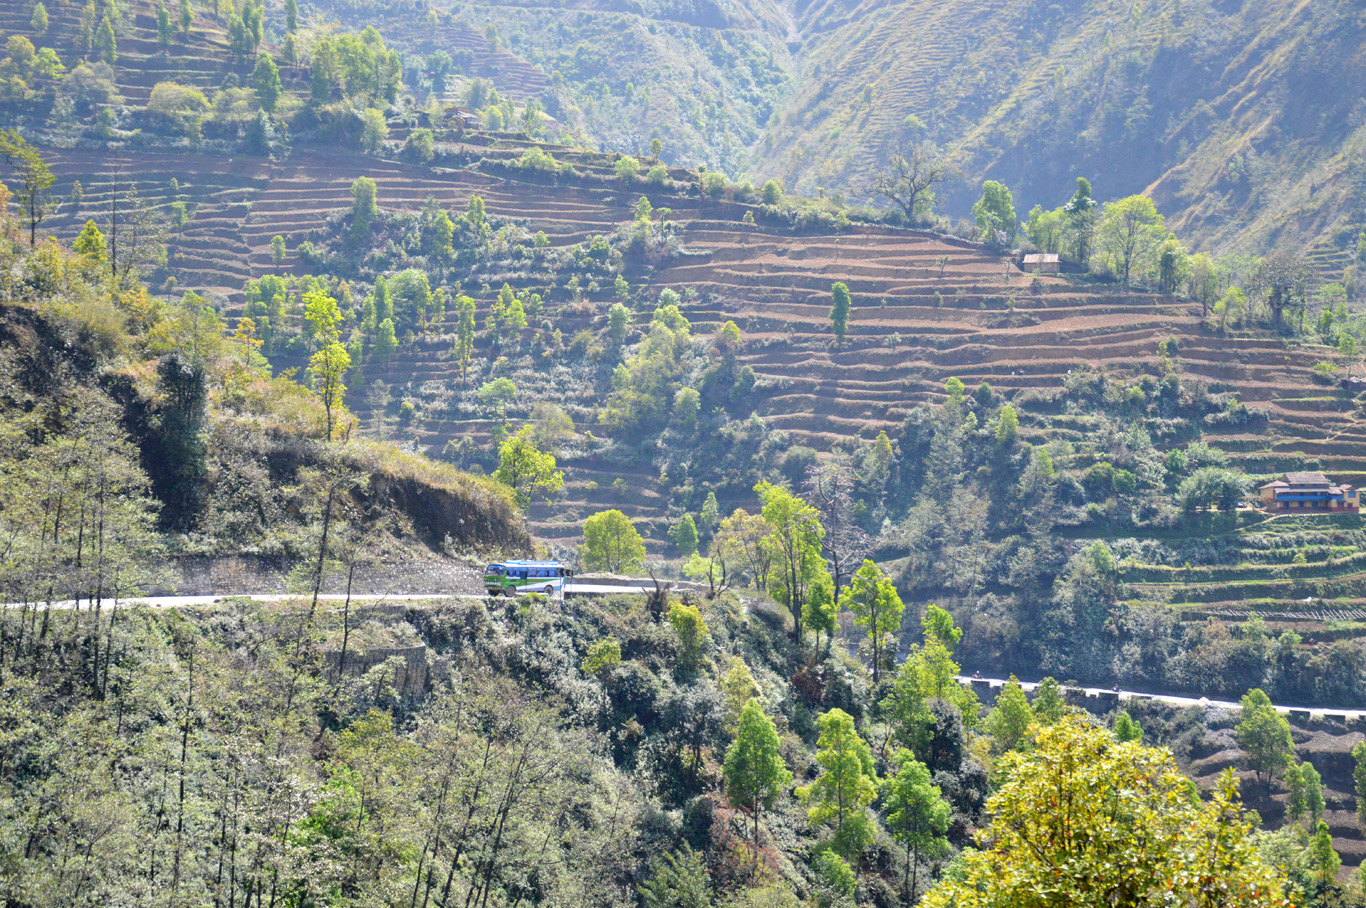 Road leading to Kathmandu